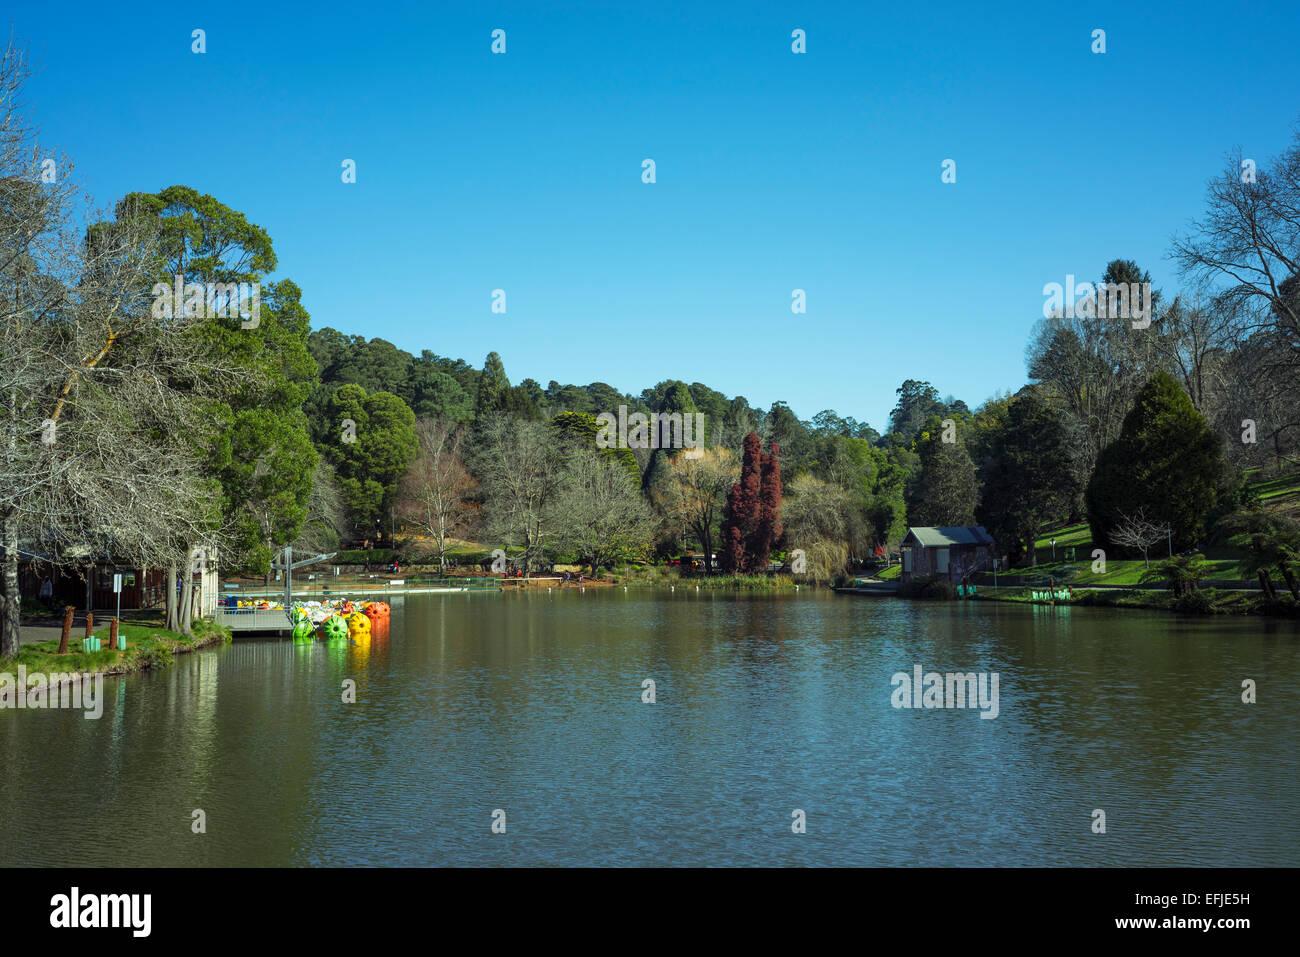 Emerald Lake Park, Melbourne, Australia - Stock Image